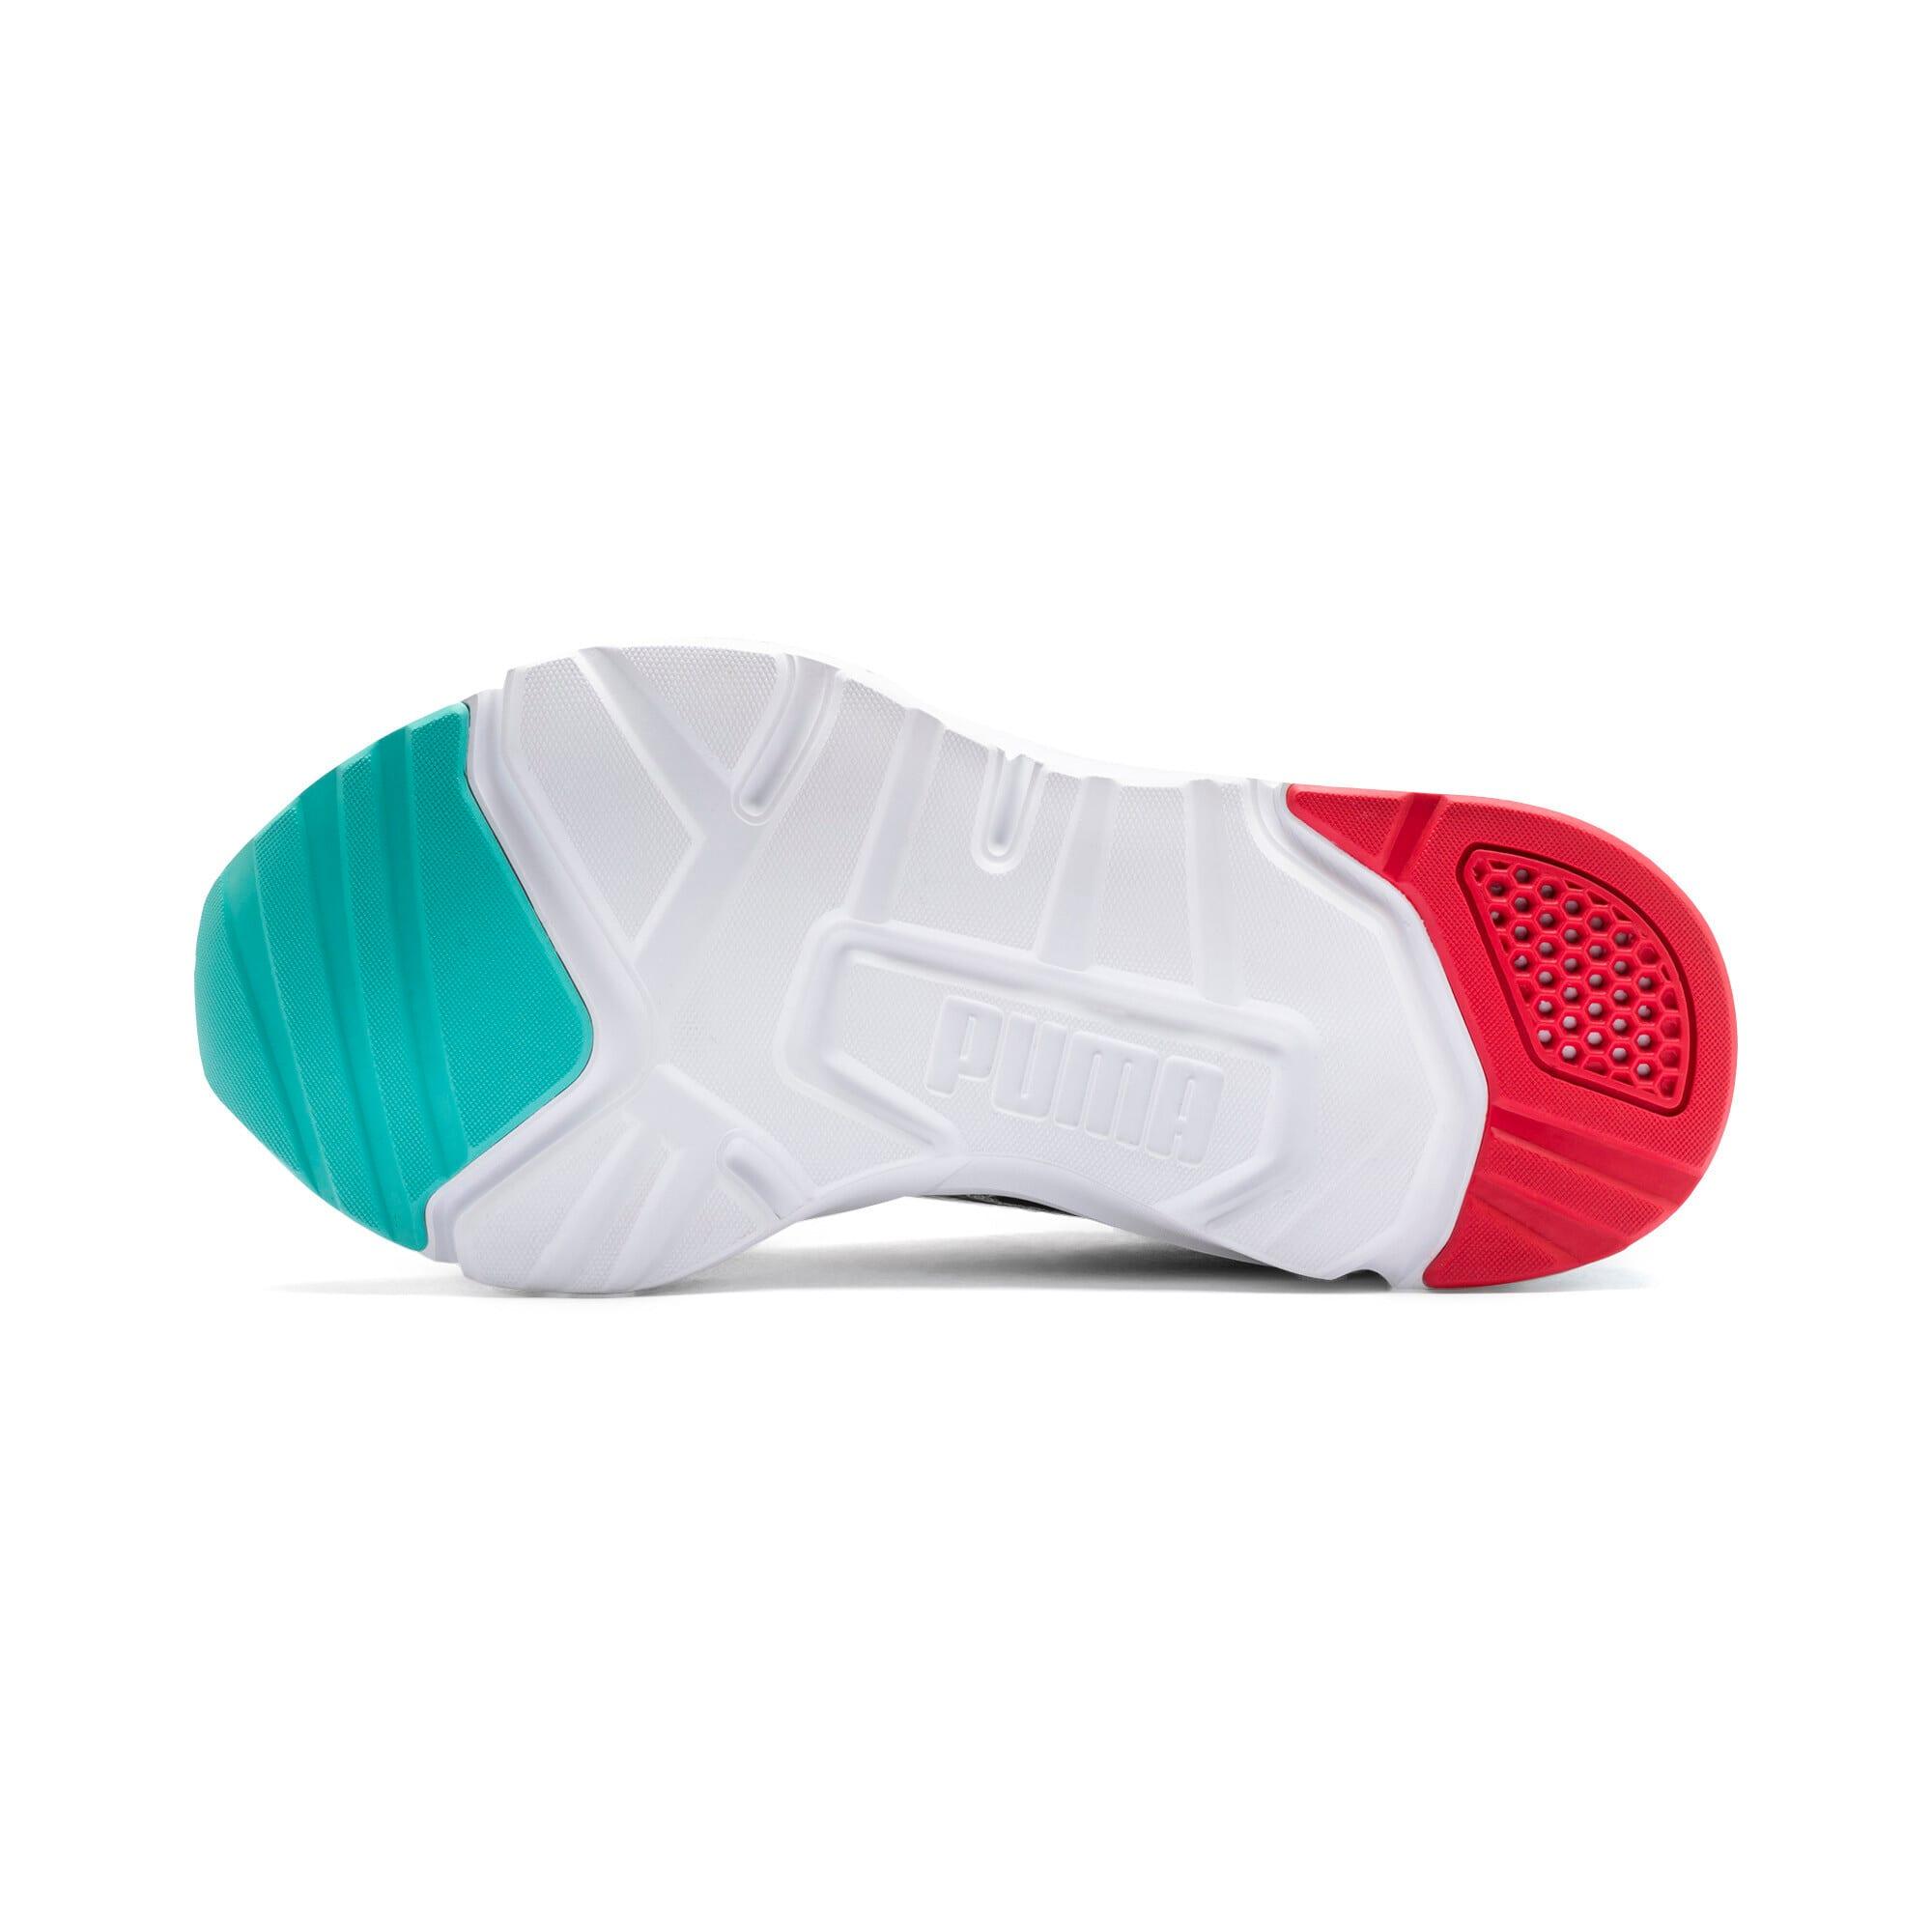 Thumbnail 3 of CELL Phase Sneakers JR, CASTLEROCK-Puma Black, medium